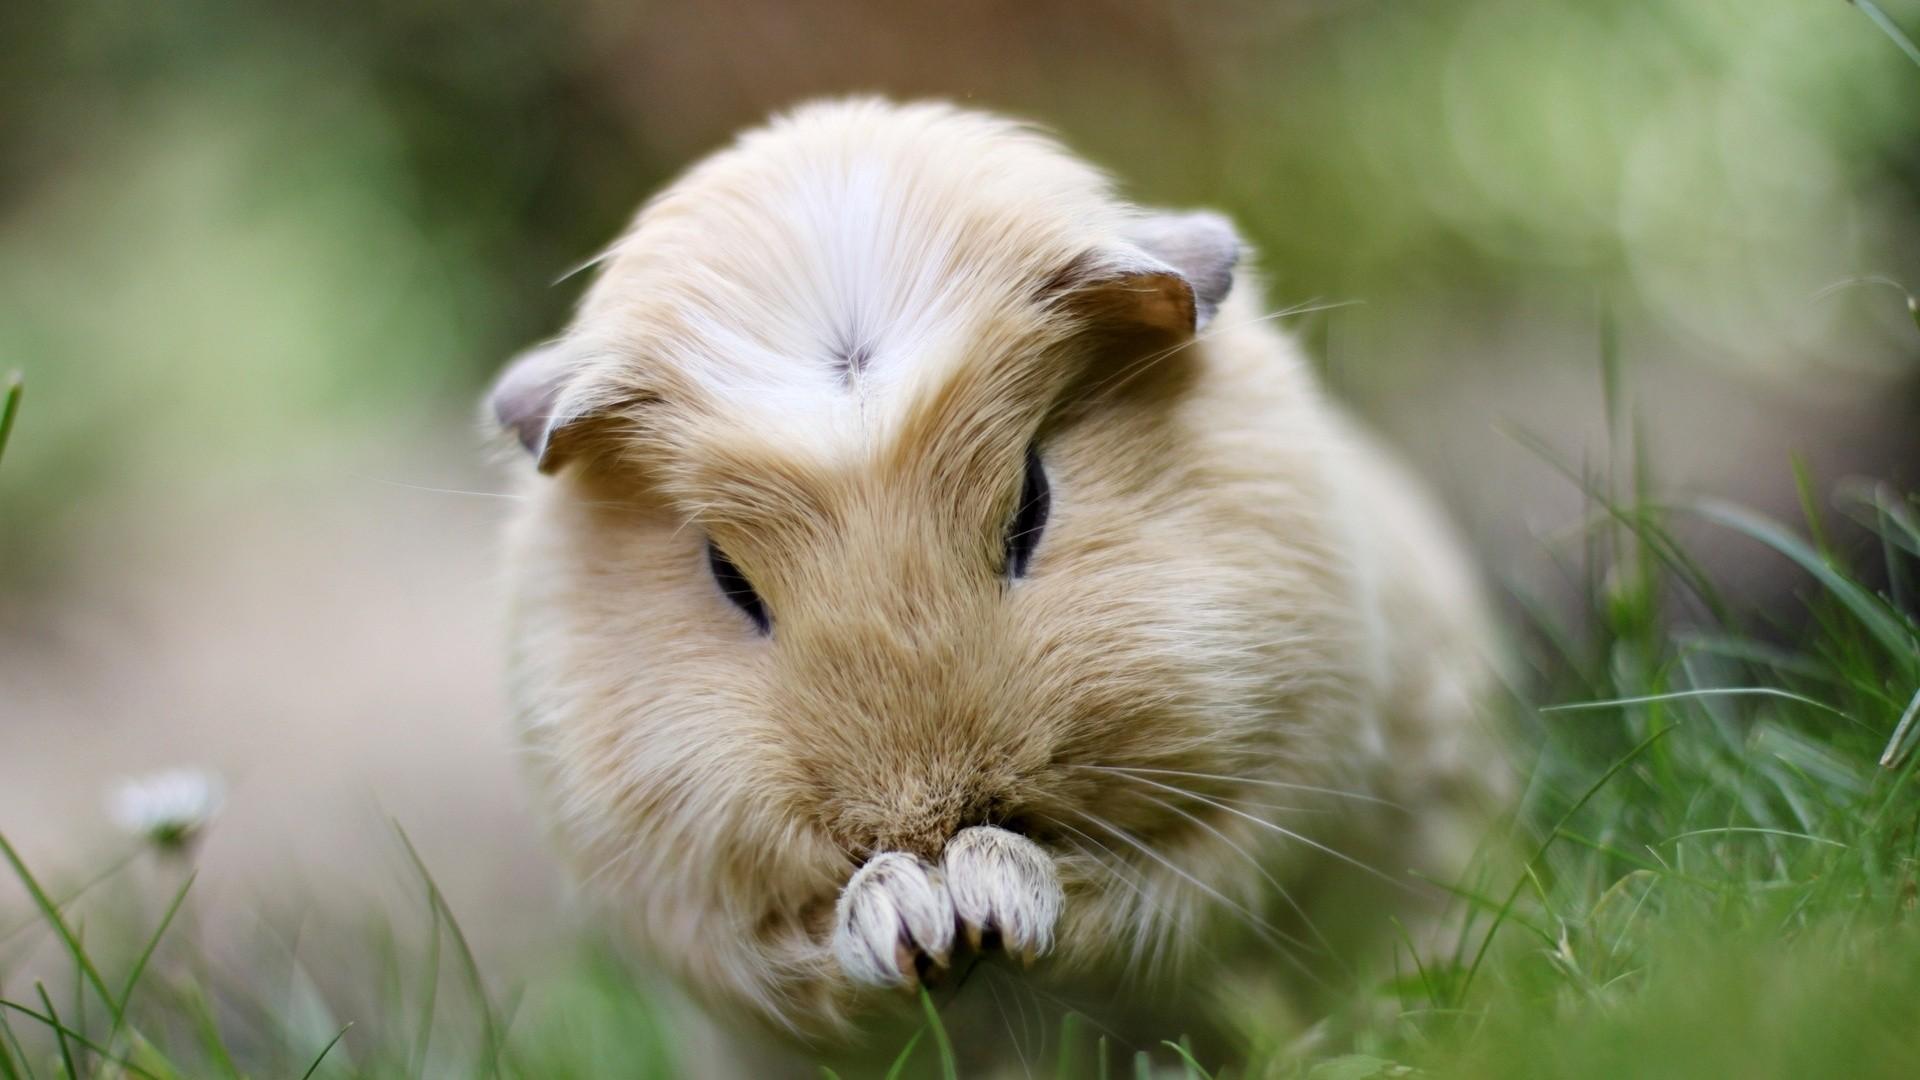 Res: 1920x1080, Guinea Pig Today · Guinea Pig Animal Hd Wallpaper X ...